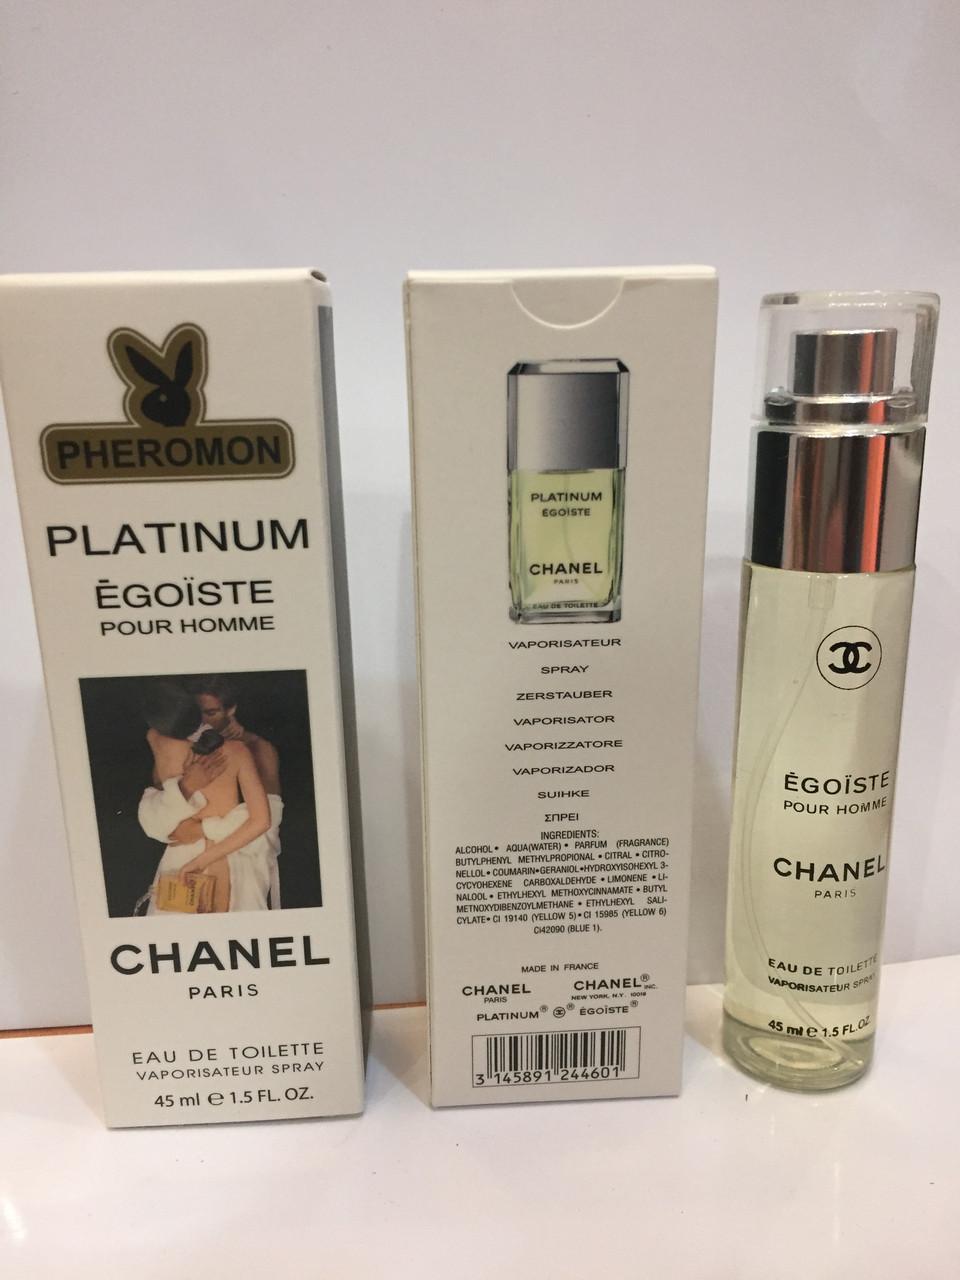 ab05055b0 Мини парфюм мужской с феромонами Chanel Egoiste Platinum (Шанель Эгоист  Платинум) 45 мл, цена 73 грн., купить в Харькове — Prom.ua (ID#213331074)